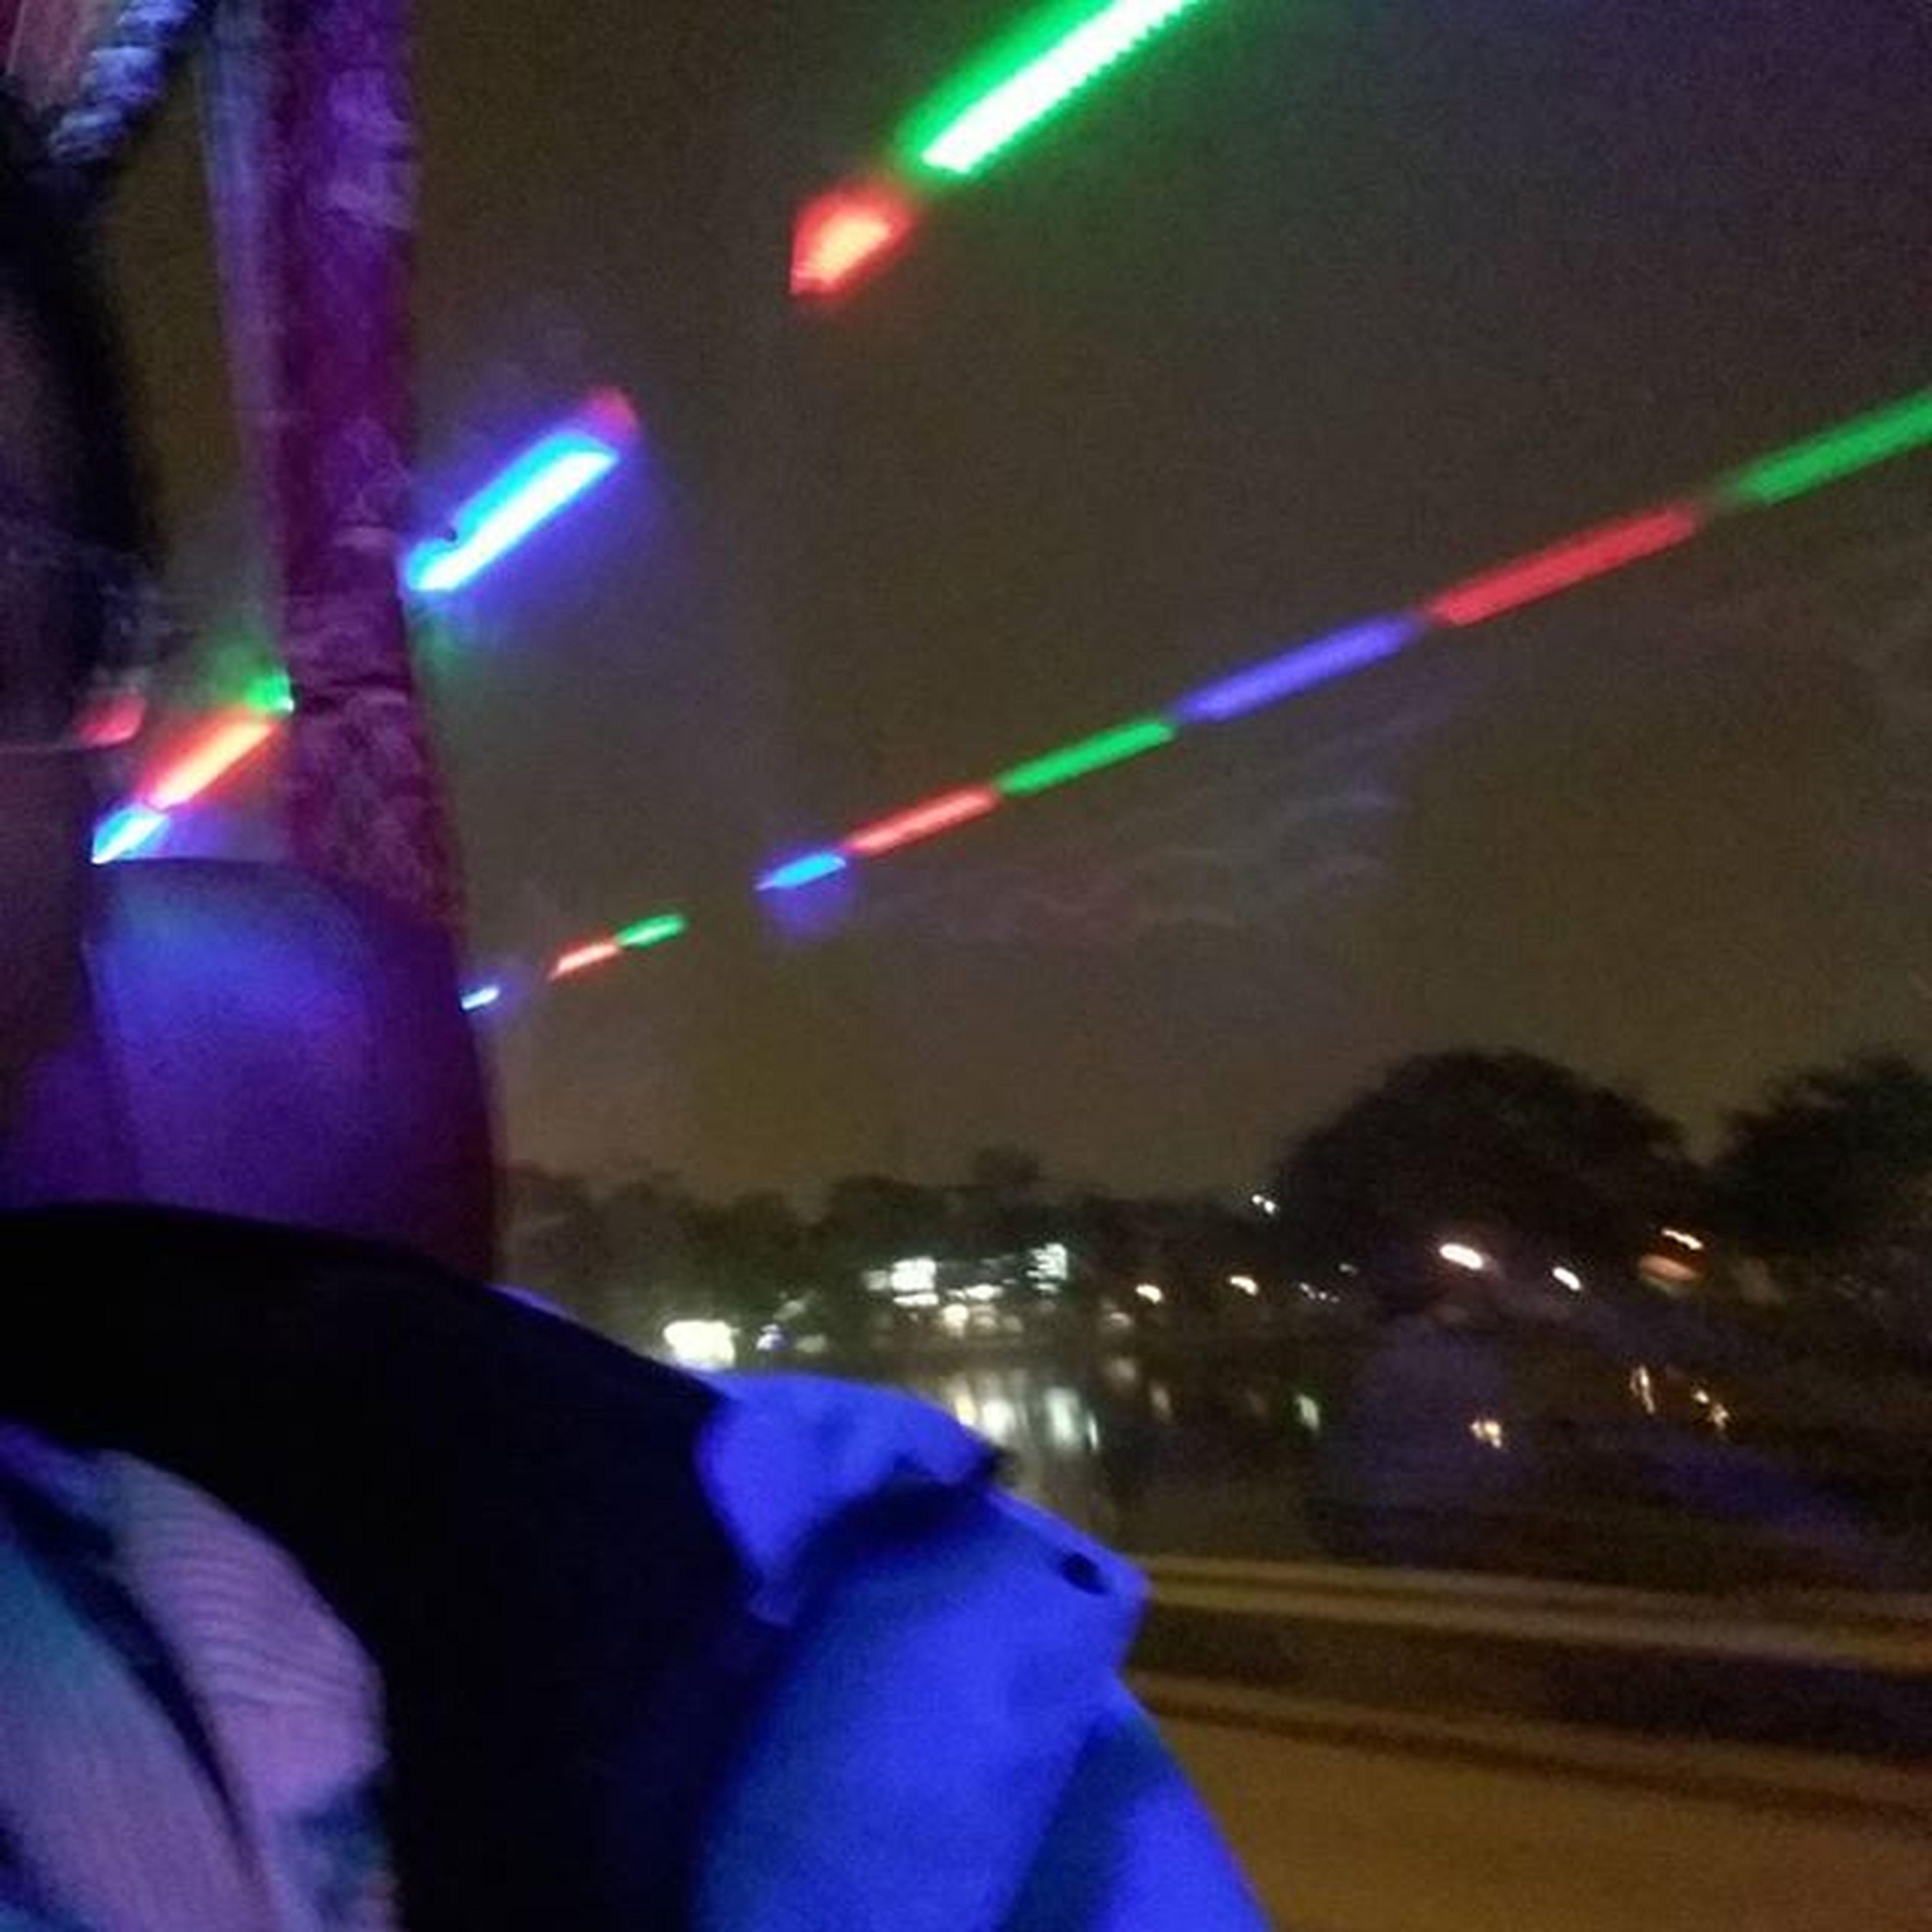 illuminated, night, defocused, light - natural phenomenon, lighting equipment, multi colored, nightlife, light trail, blurred motion, blue, long exposure, transportation, light, glowing, arts culture and entertainment, nightclub, motion, light beam, speed, road